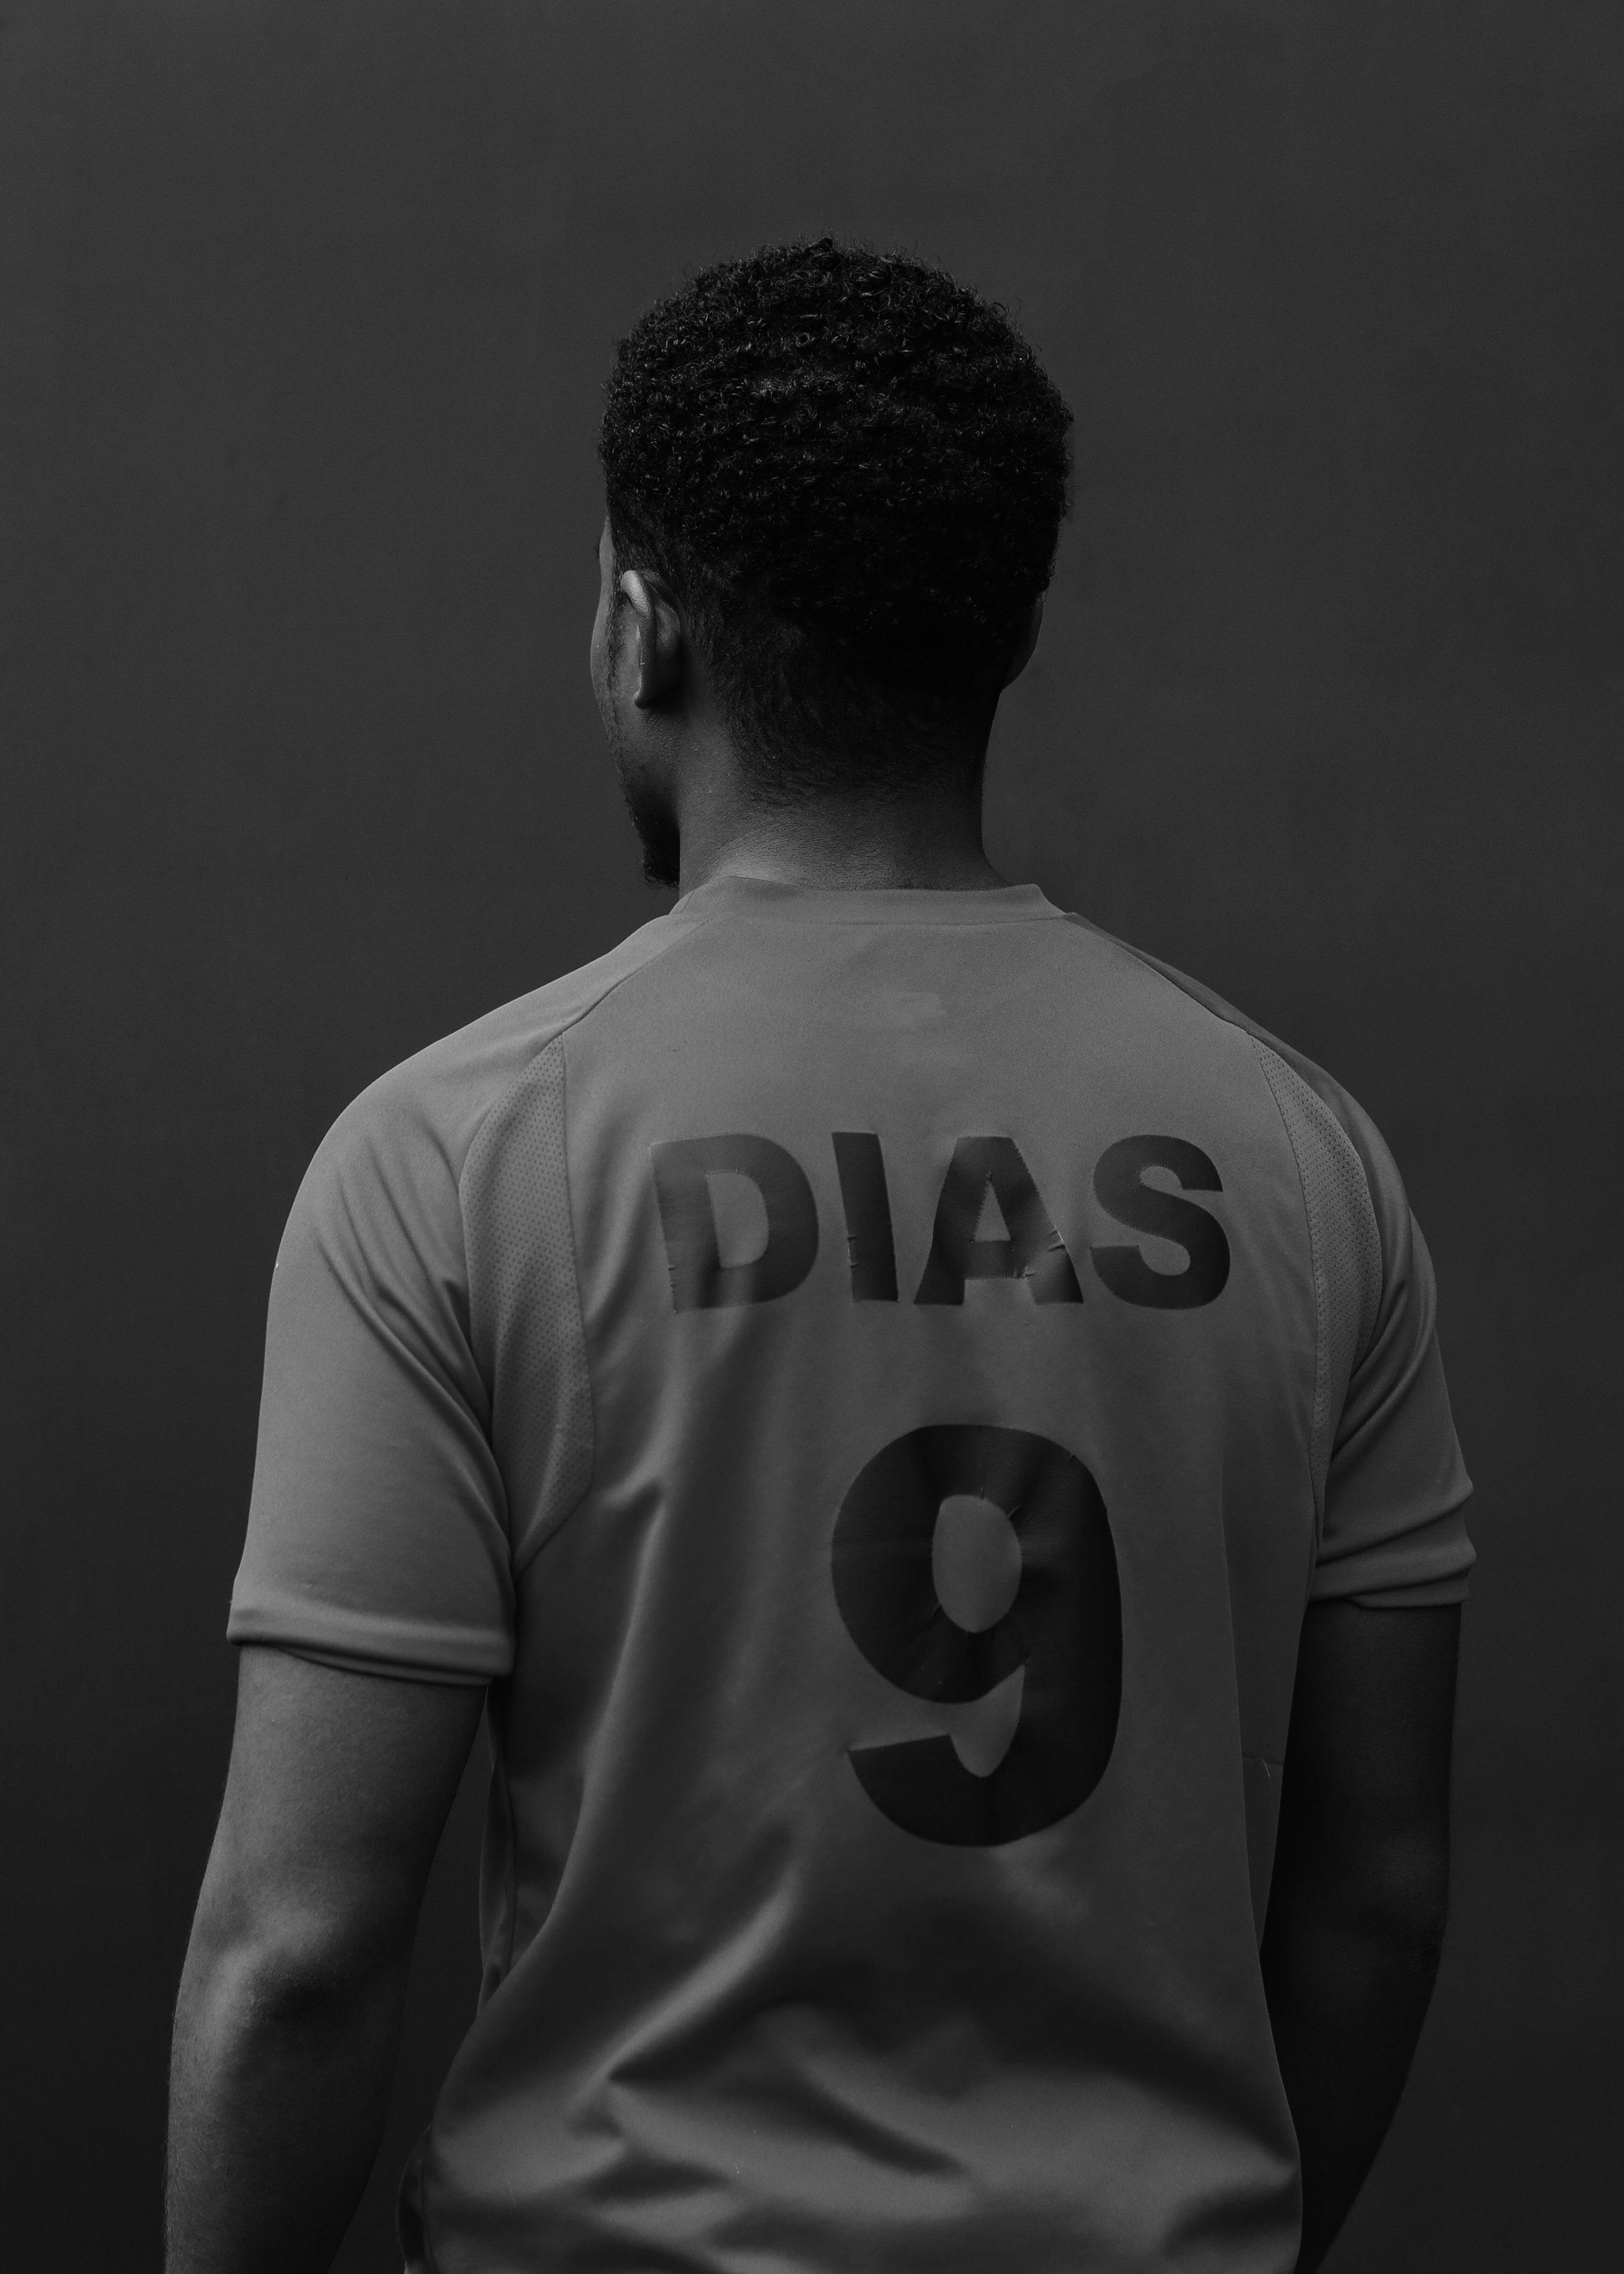 dias black and white.jpg